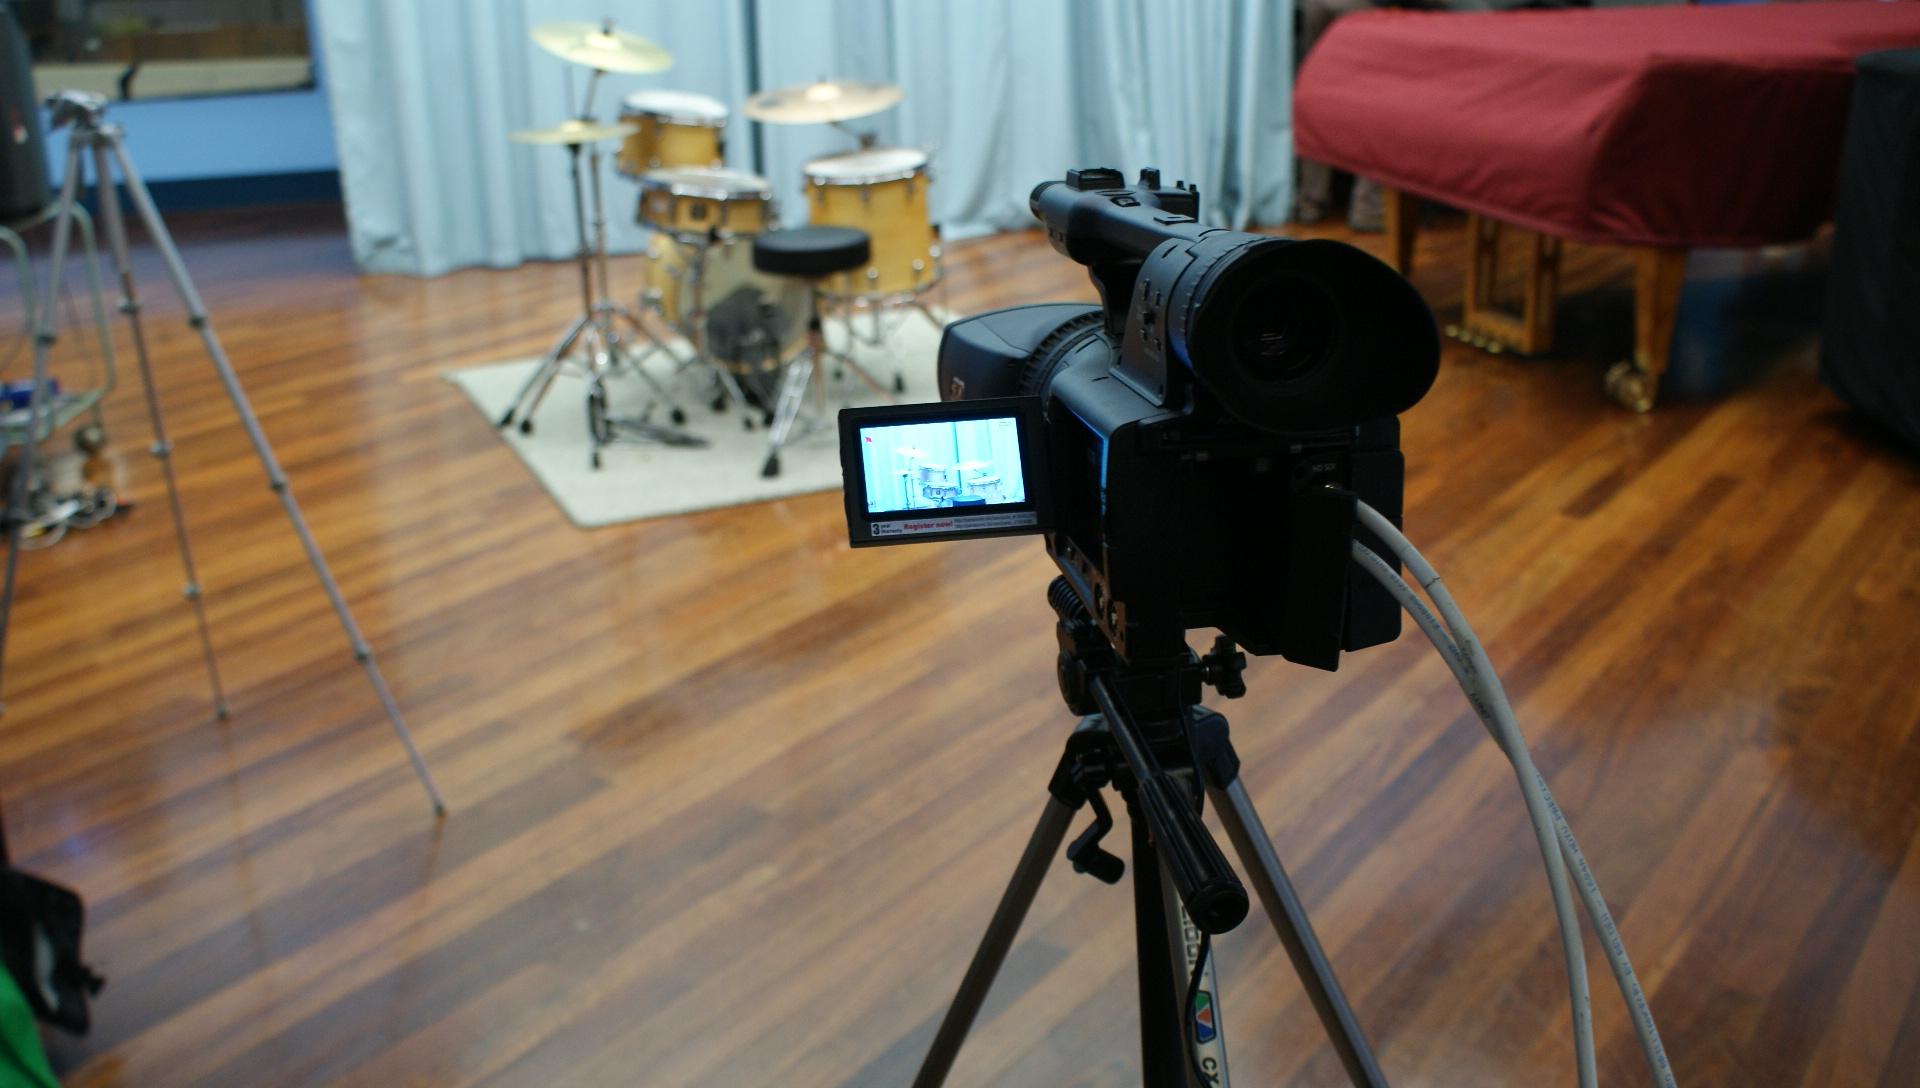 Syna_1 Setup: Stereoscopic Camera for AARNet live feed